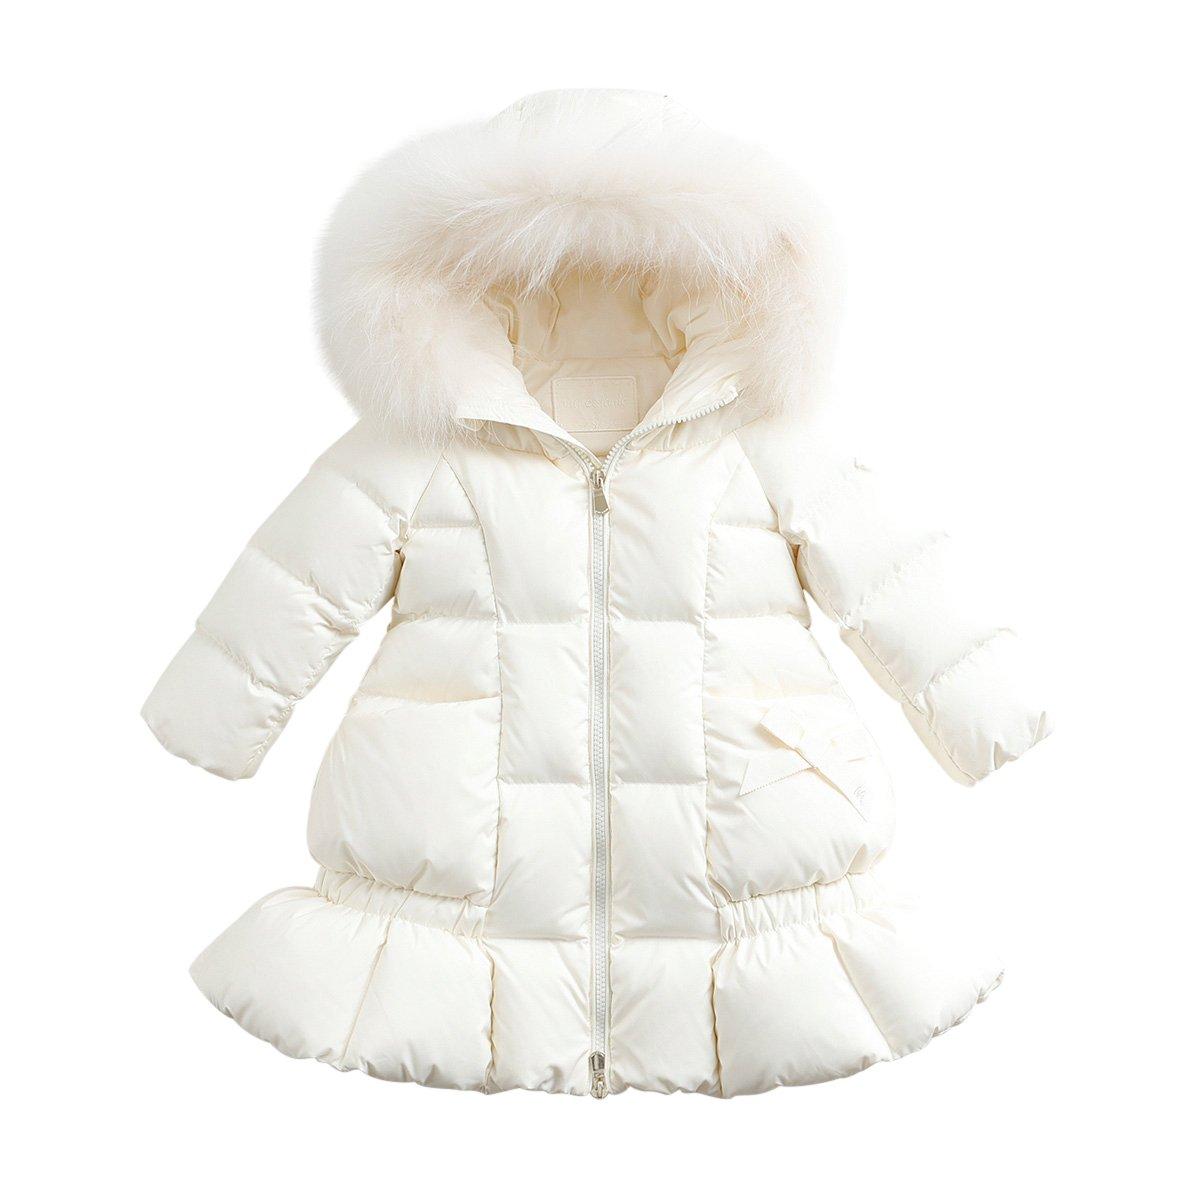 marc janie Baby Girls Kids' Lightweight Down Jacket With Raccoon Fur Collar Hood Puffer Winter Coat Off White 6T